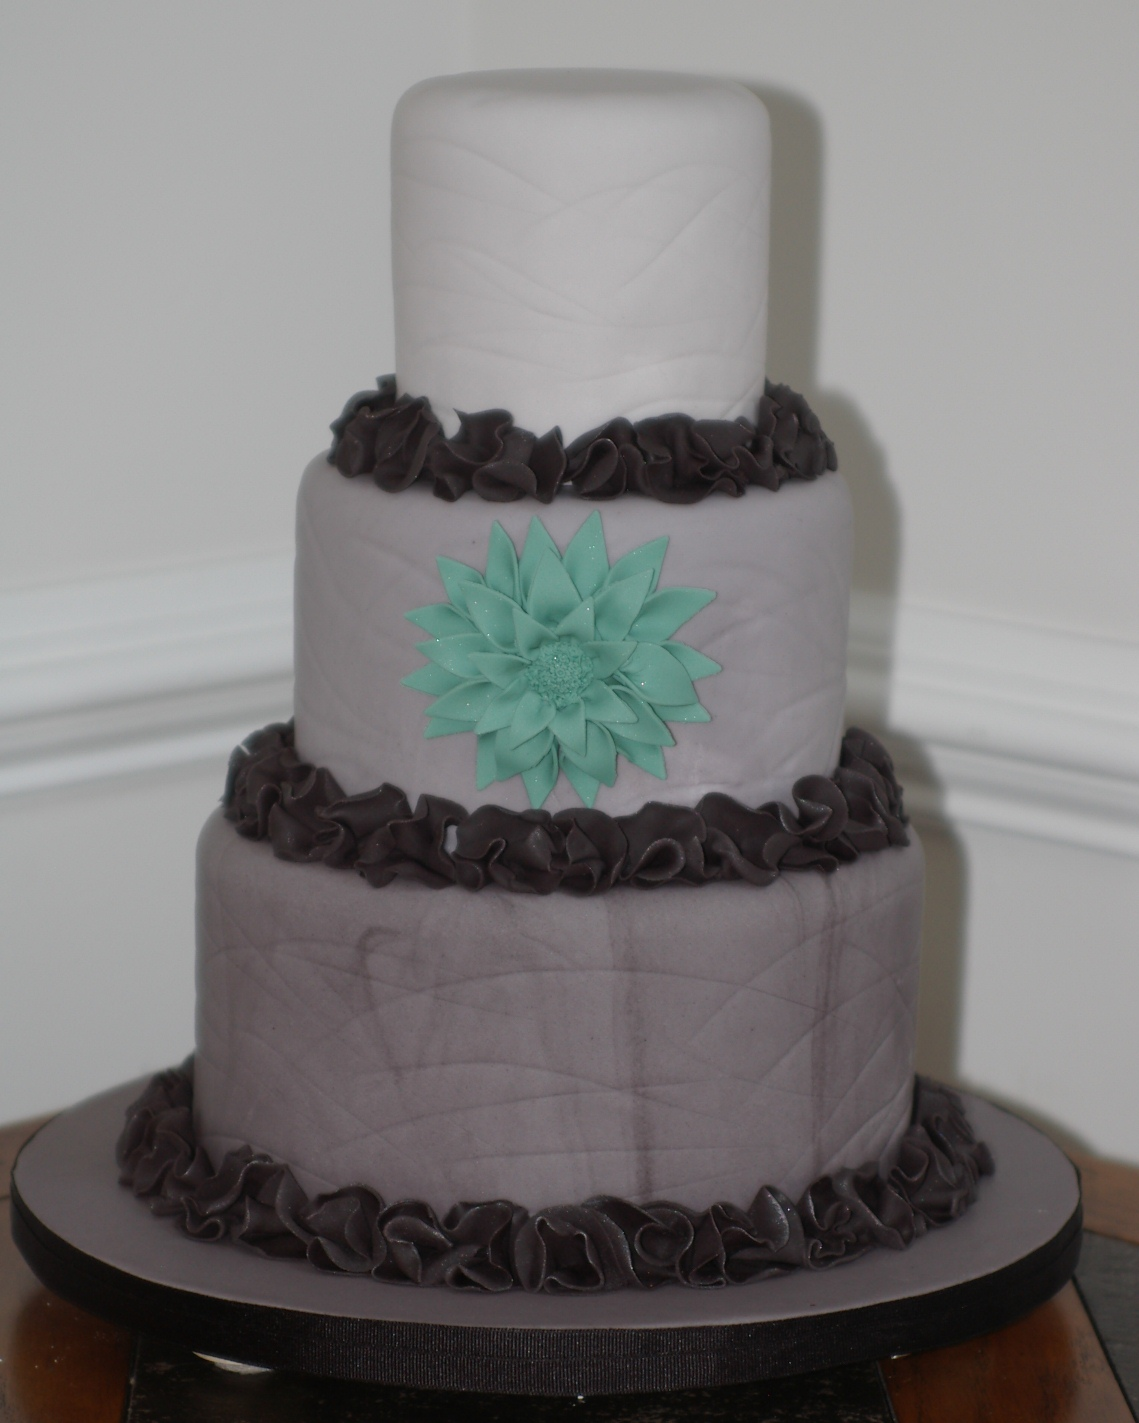 Ices Cake Organization